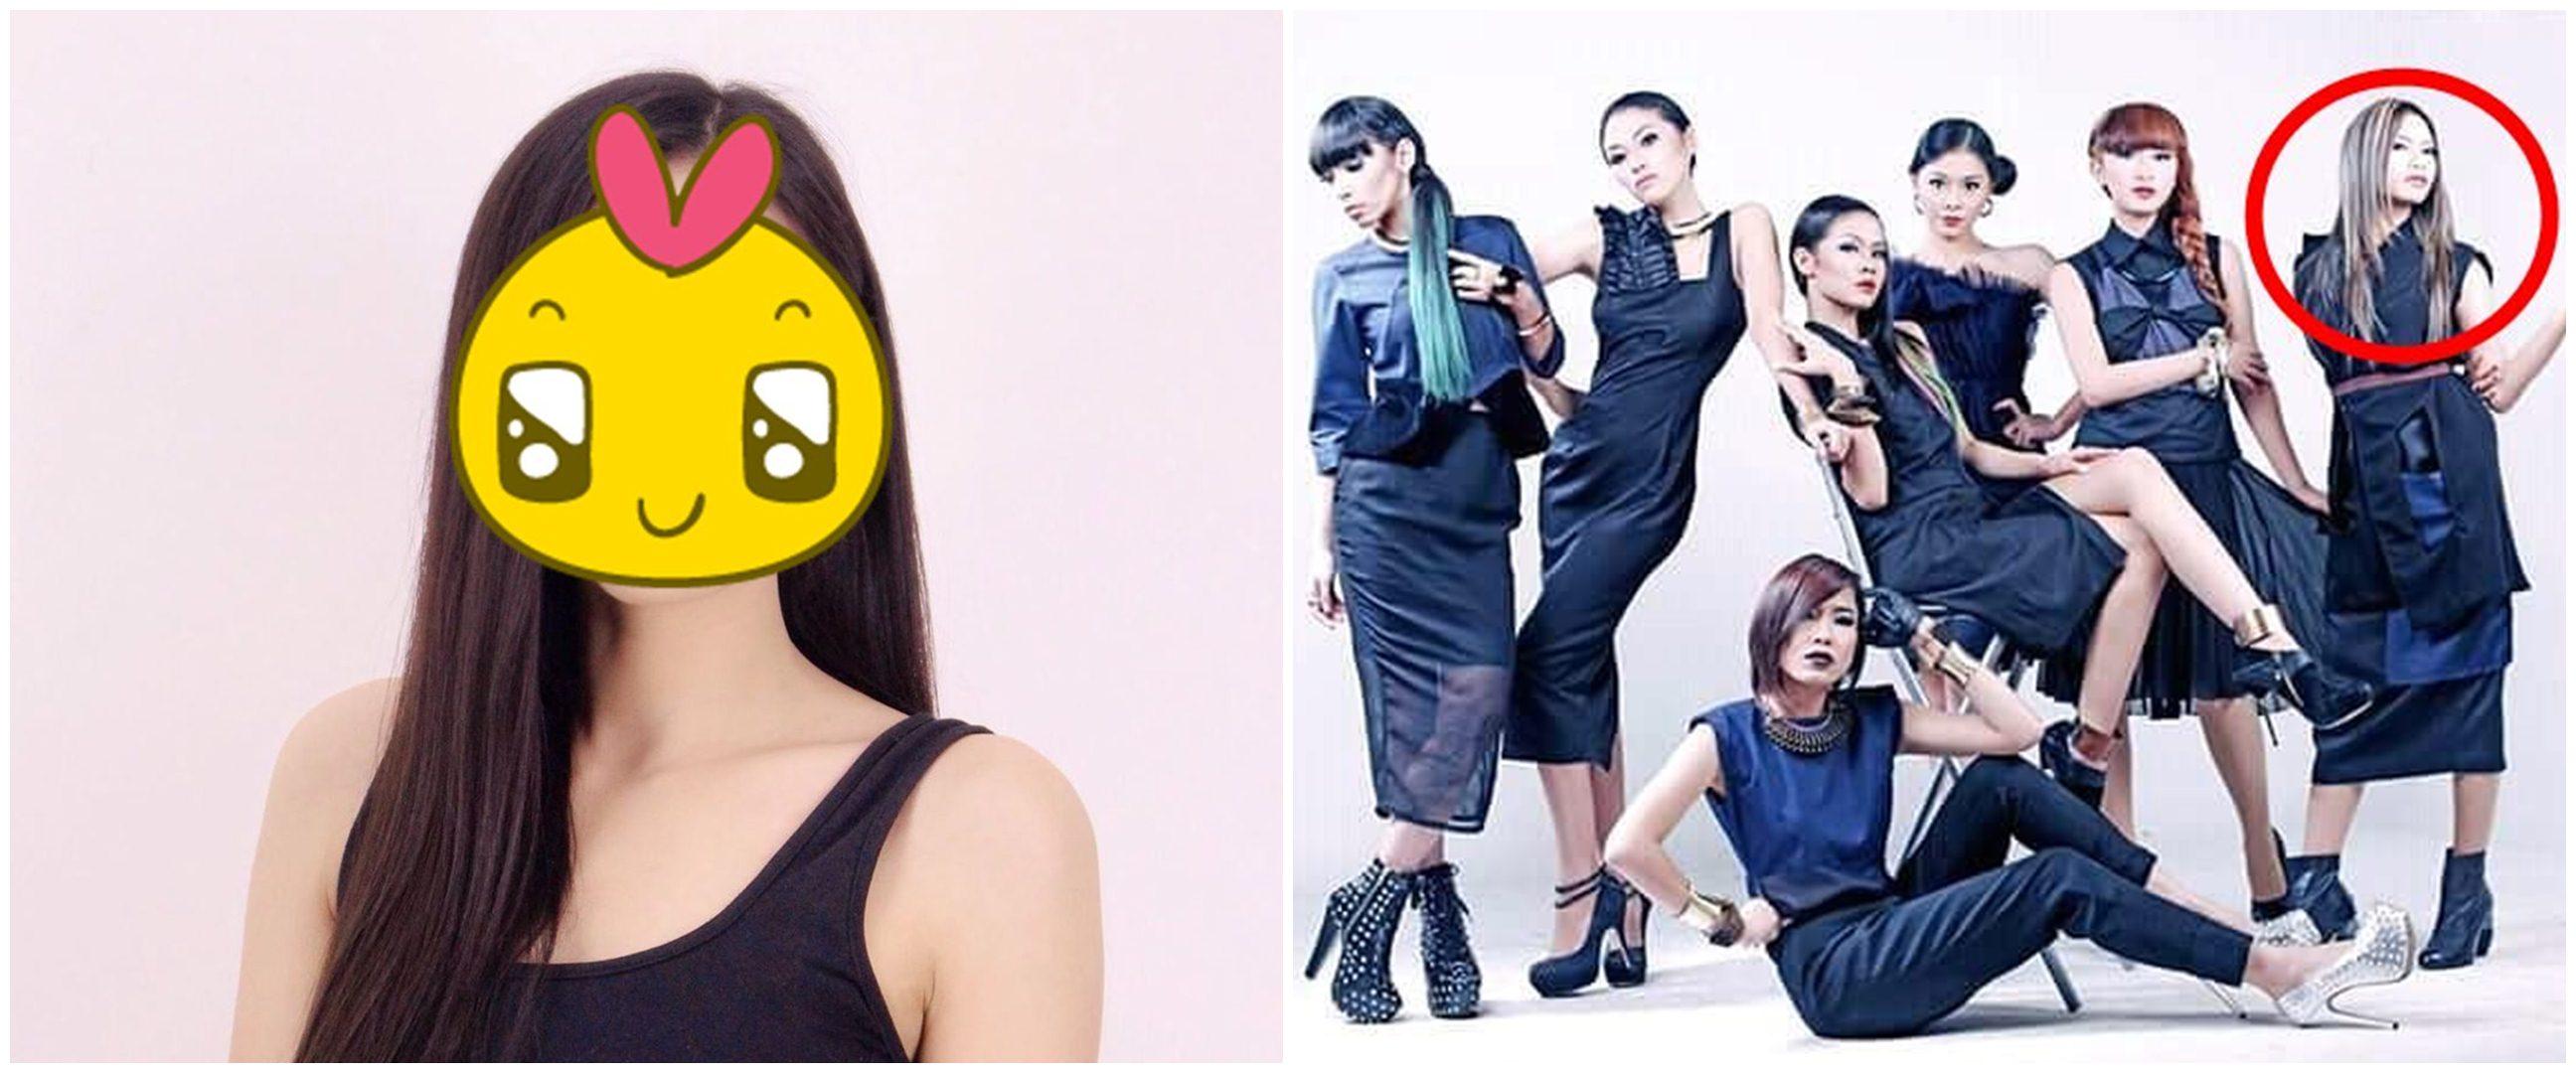 8 Potret terbaru Grace Wohangara eks 7 Icons, makin memesona